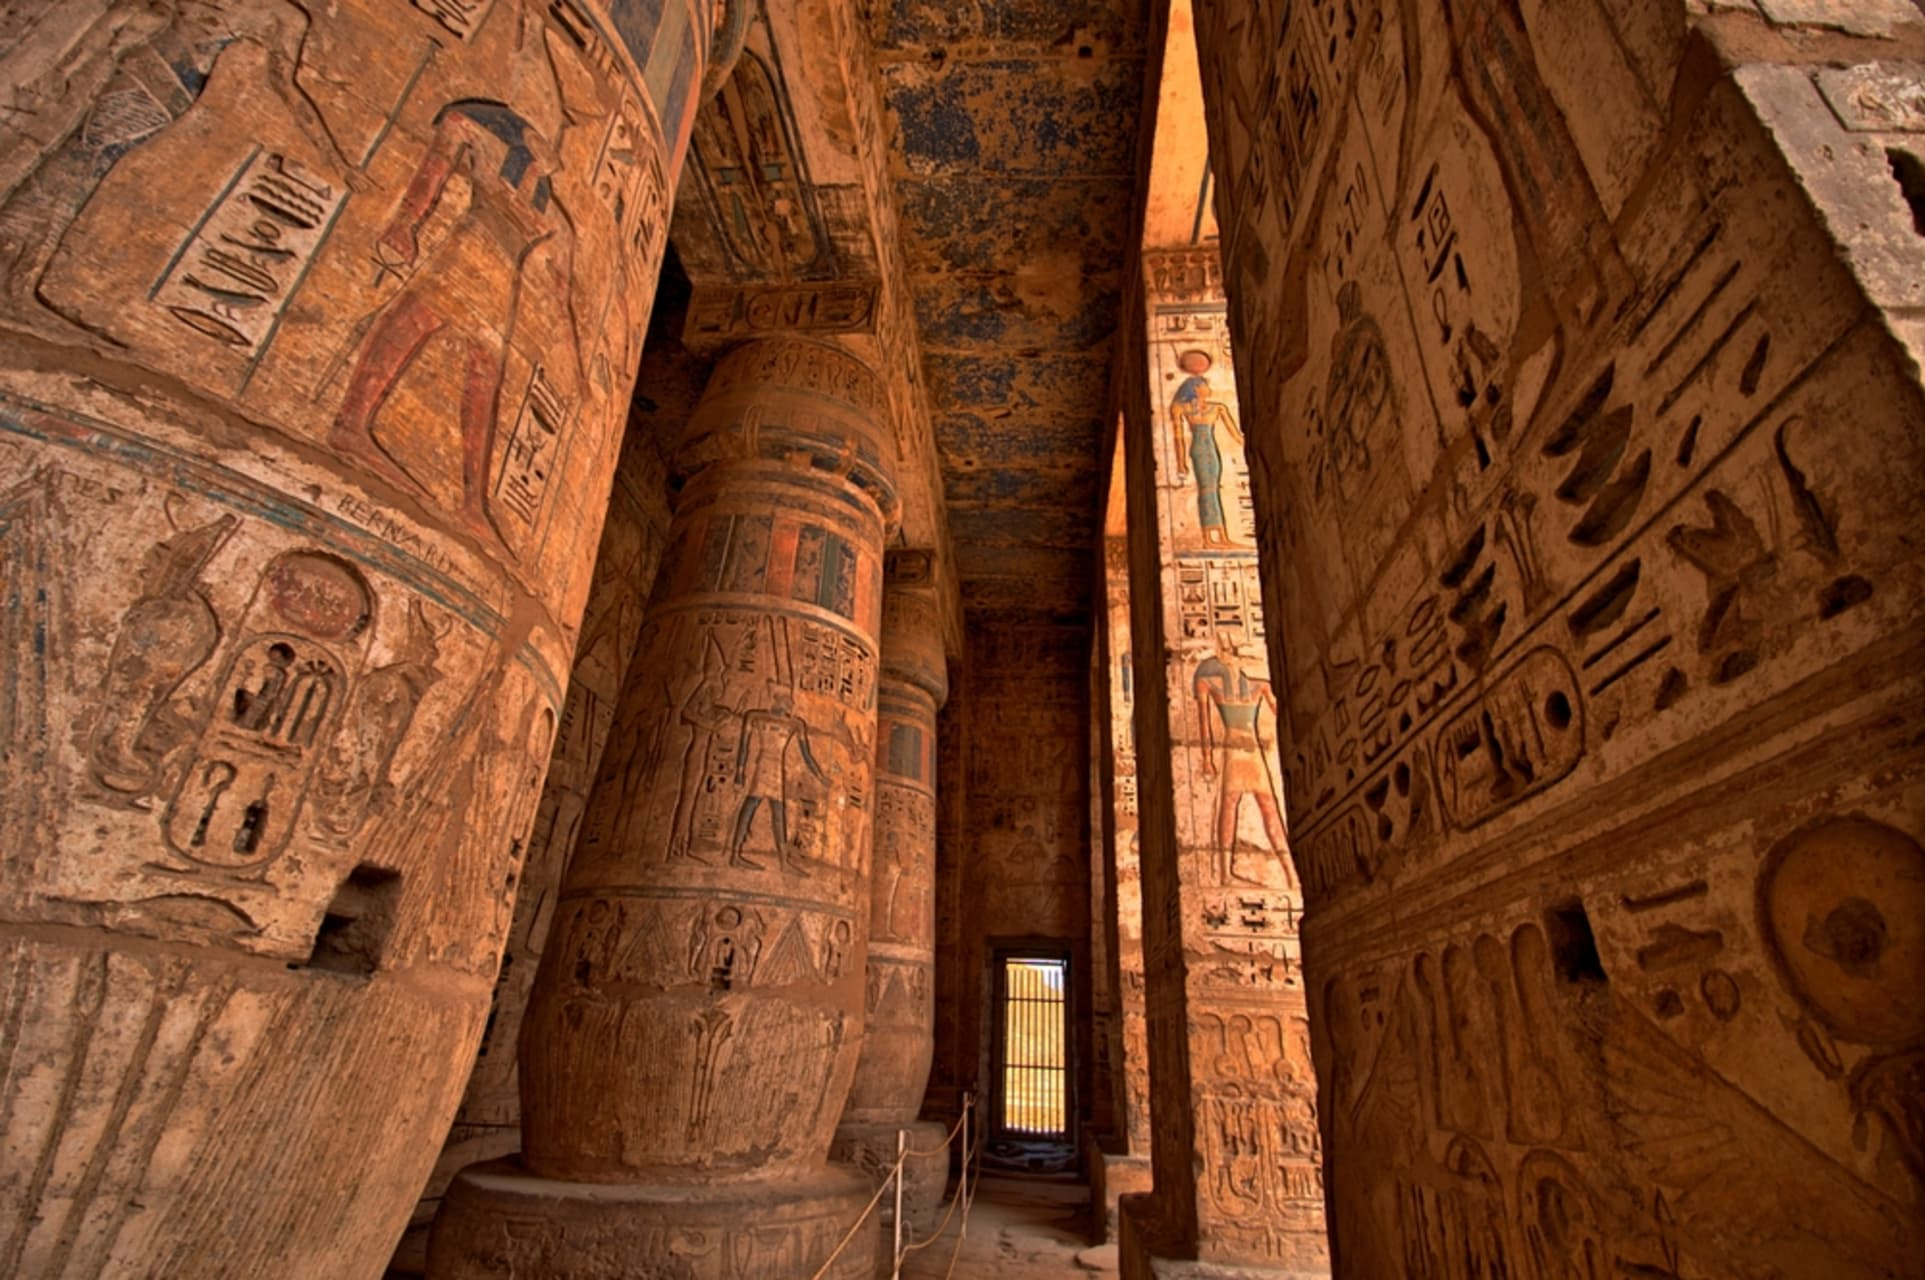 Luxor - The Conspiracy Of Medinat Habu